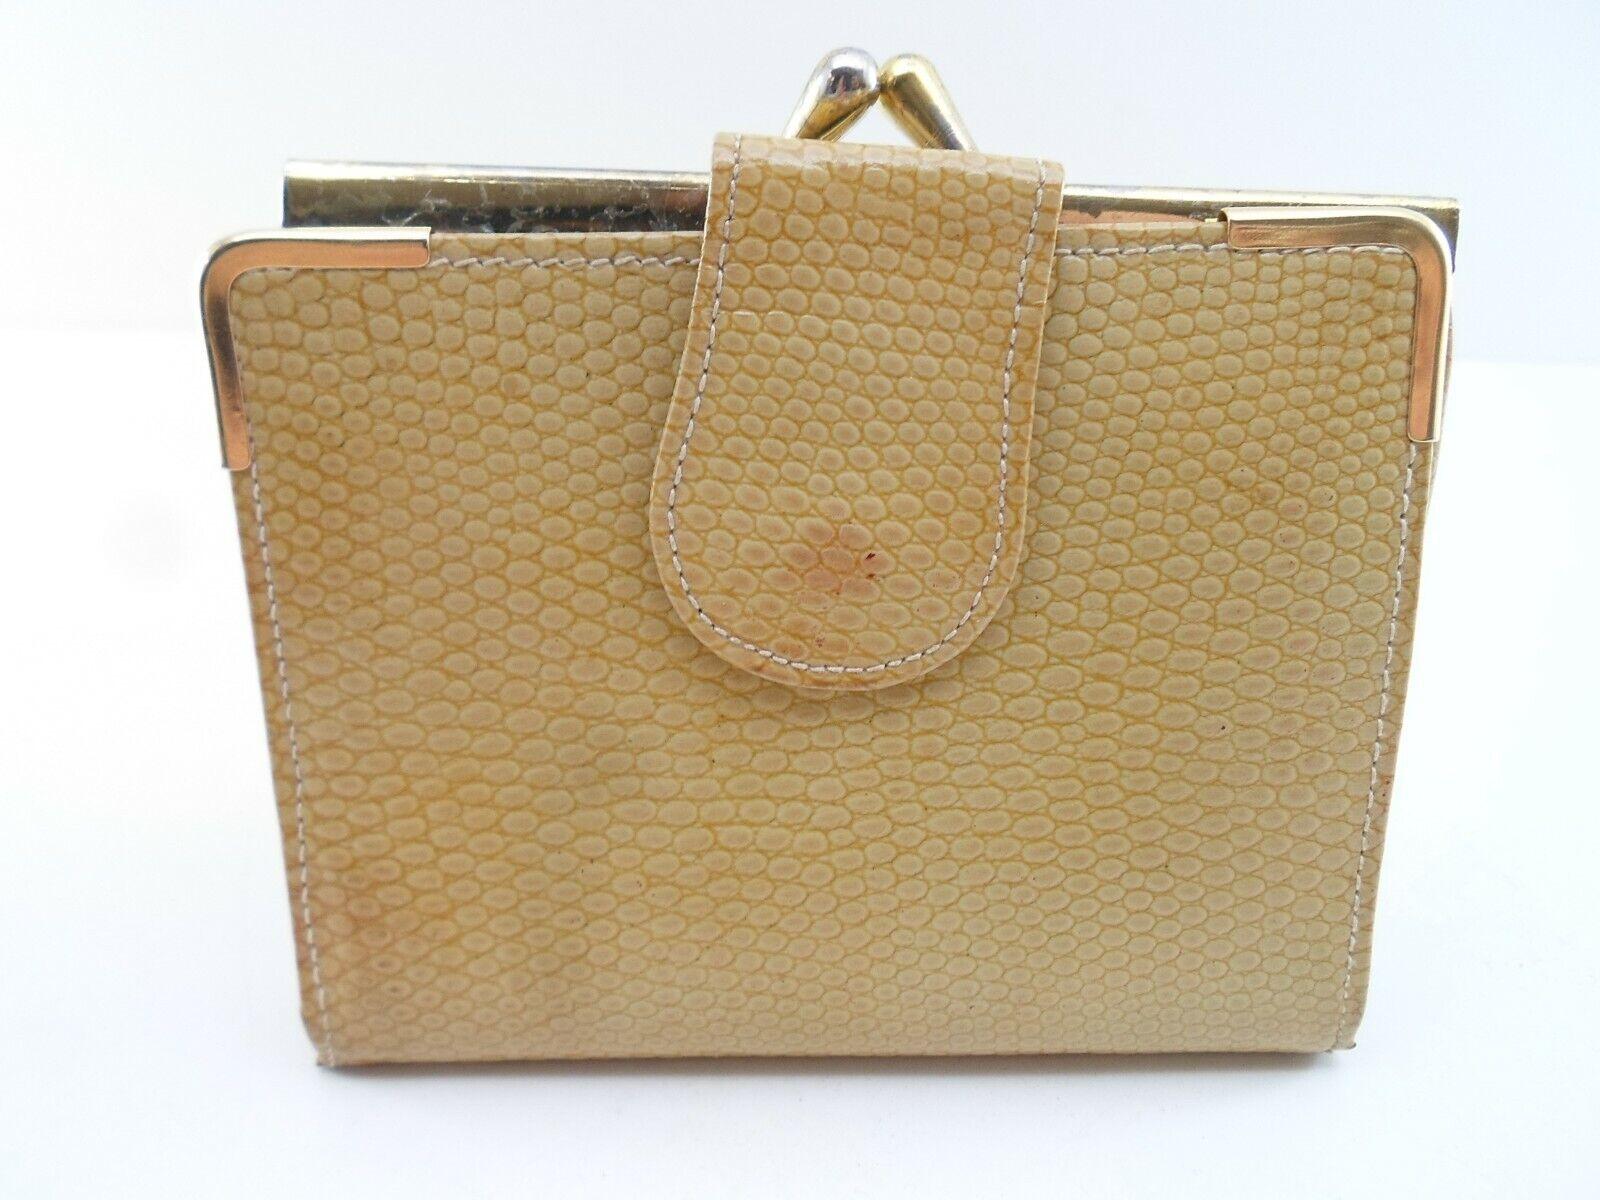 Lodis Vintage Made in England Faux Snakeskin Bifold Wallet Beige Brown 1980s